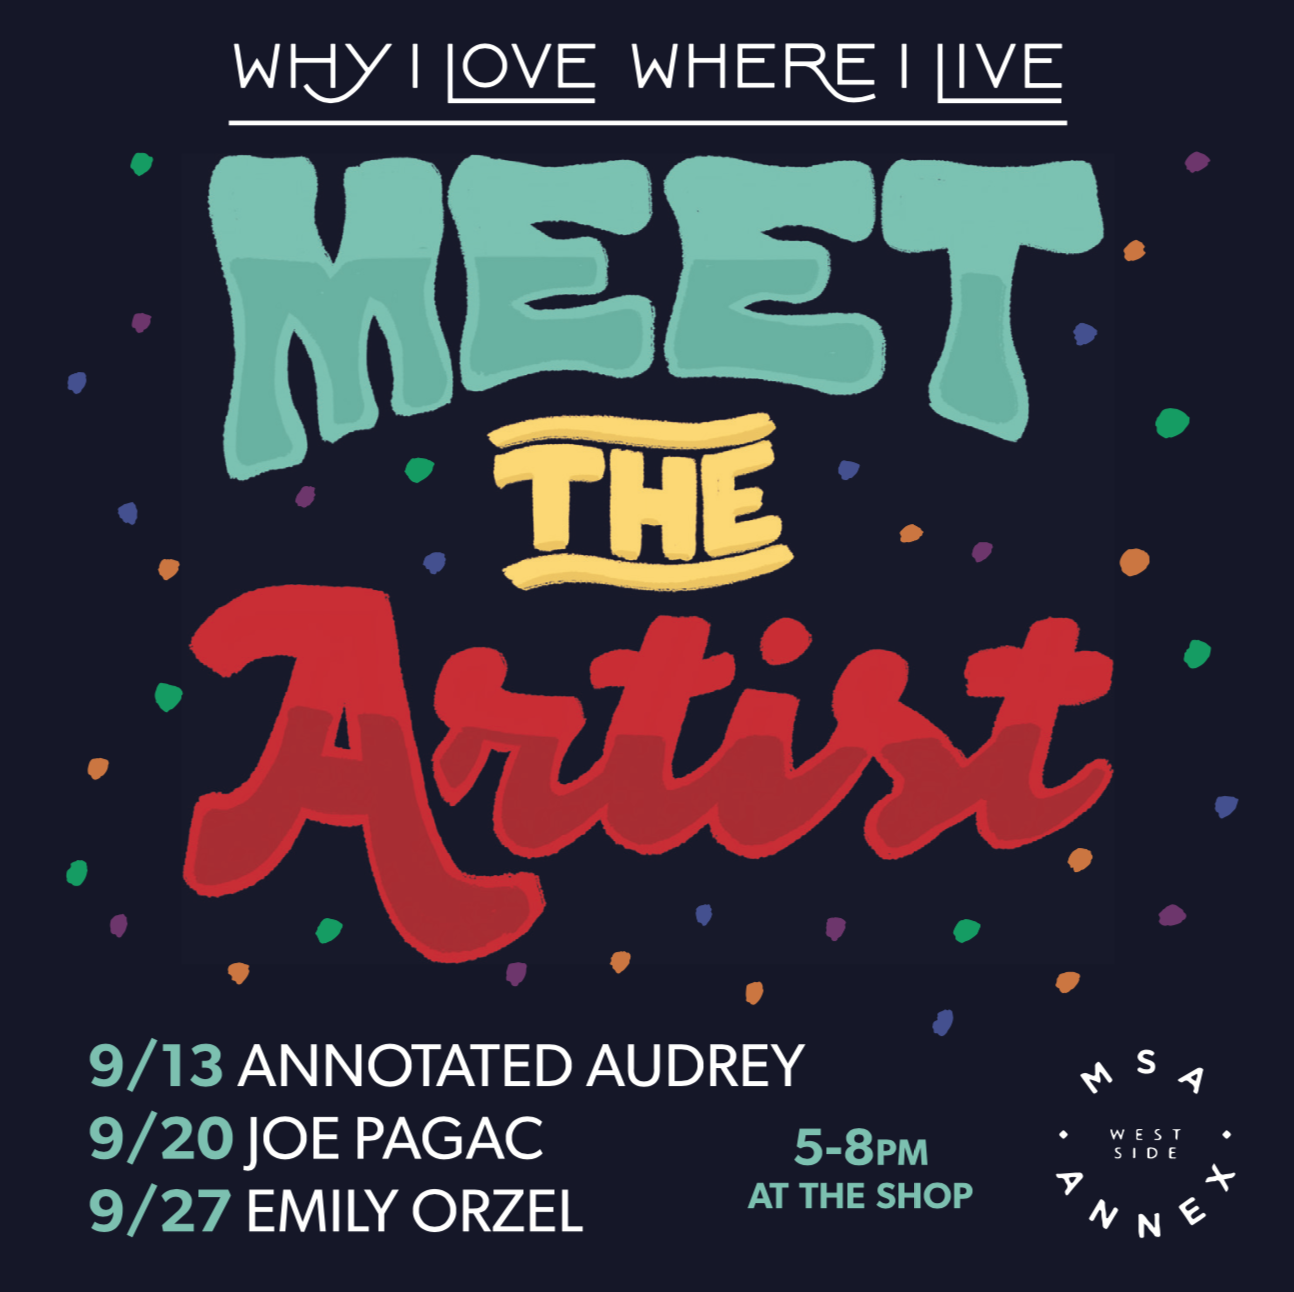 meet-the-artist-tucson